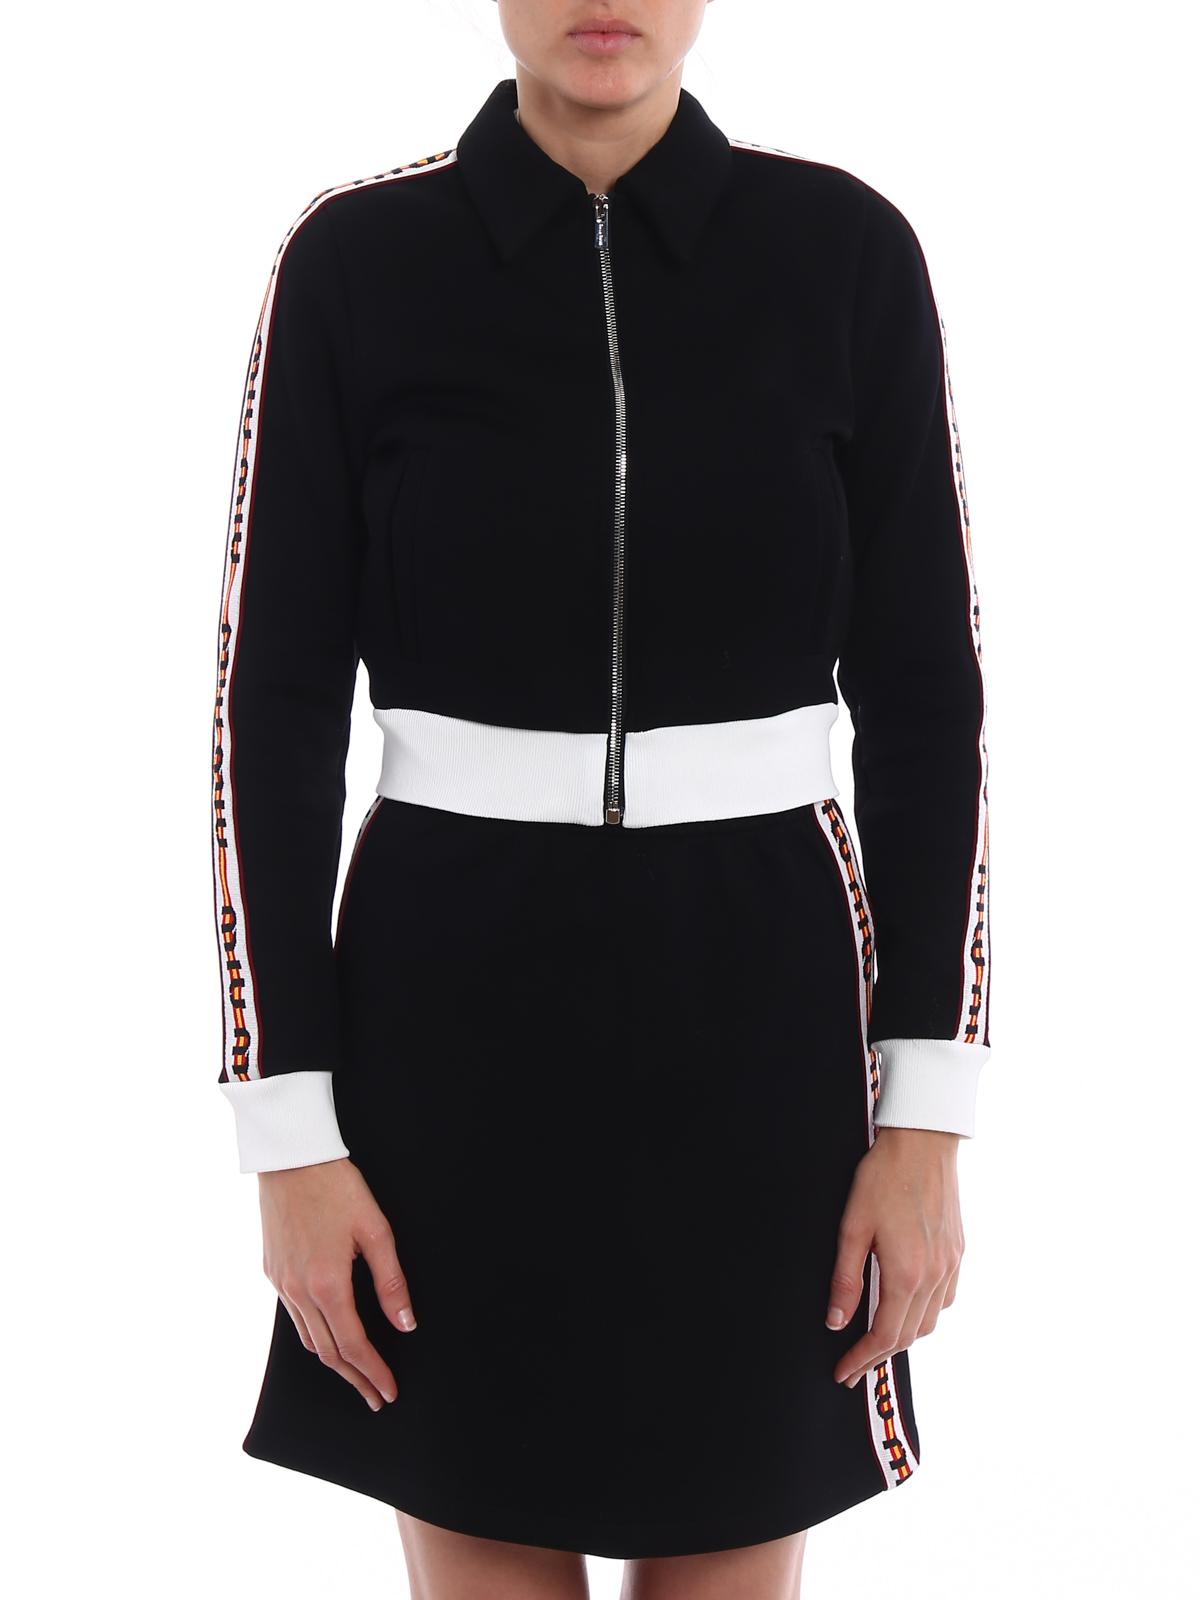 For Nice Online Official Cheap Price logo sweatshirt Miu Miu Cheap Sale Amazon f8JQK3z3pD